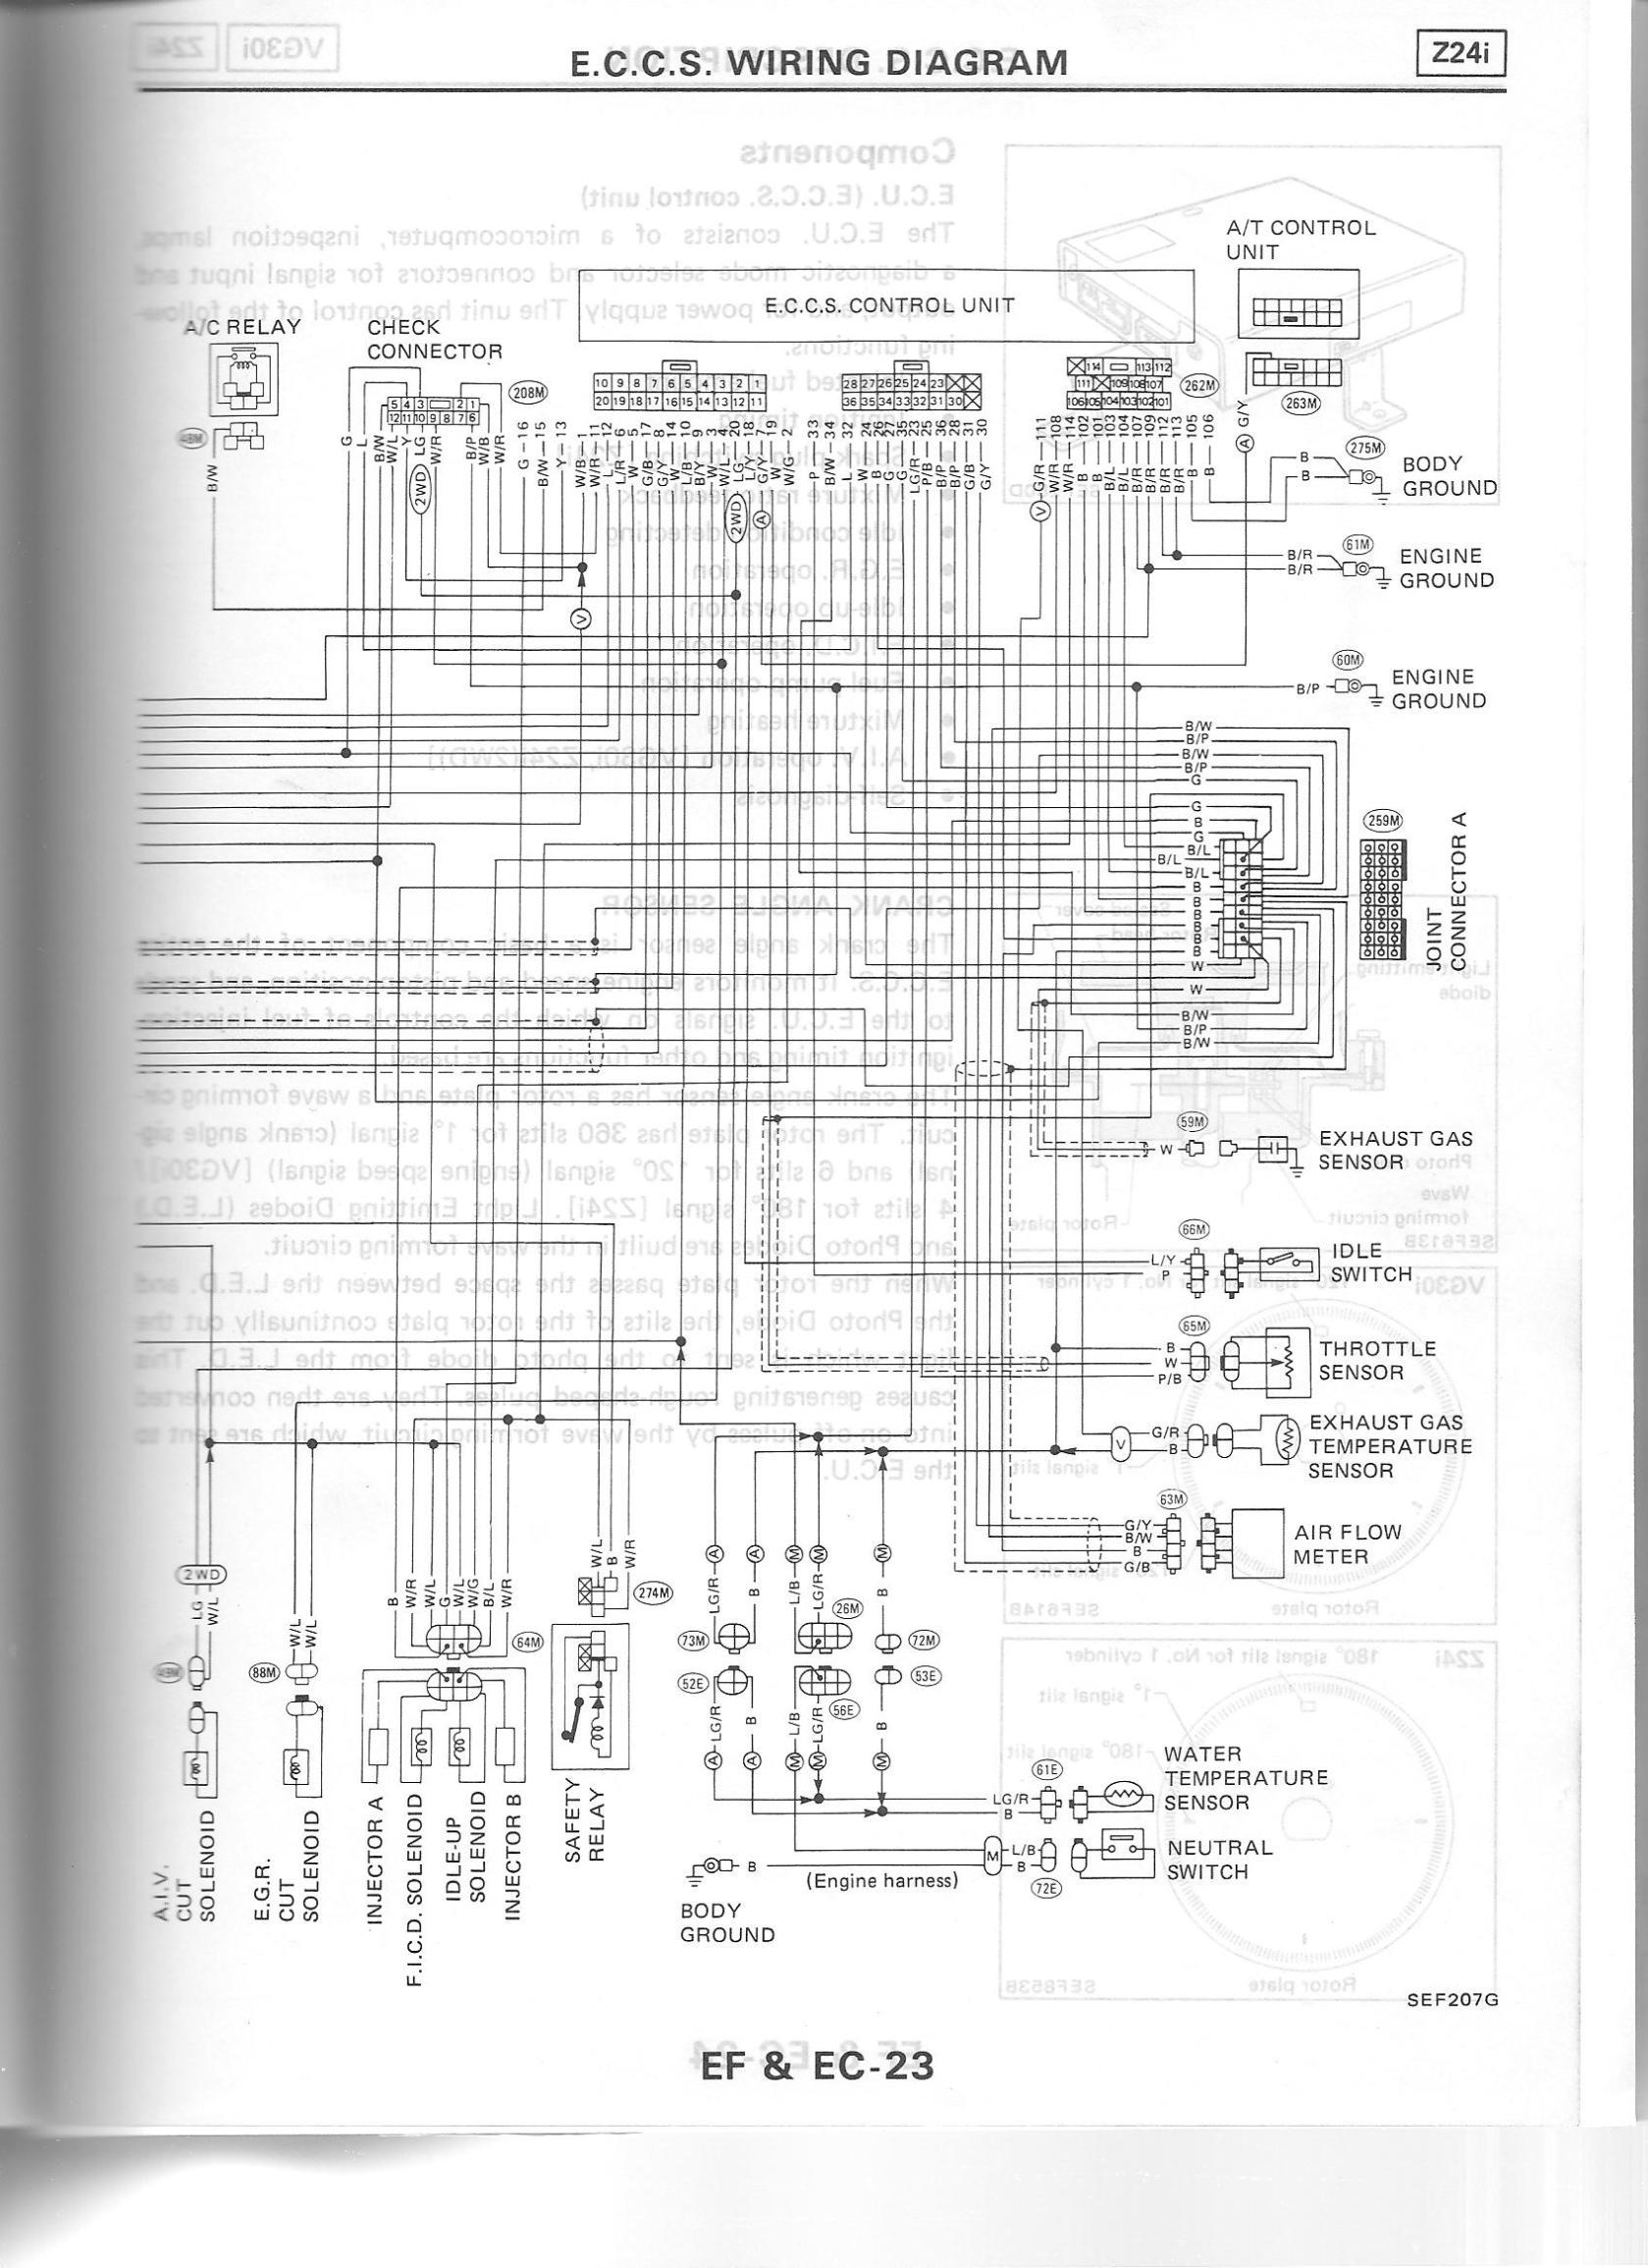 nissan navara d40 headlight wiring diagram nissan nissan navara d40 wiring schematic wiring diagram on nissan navara d40 headlight wiring diagram